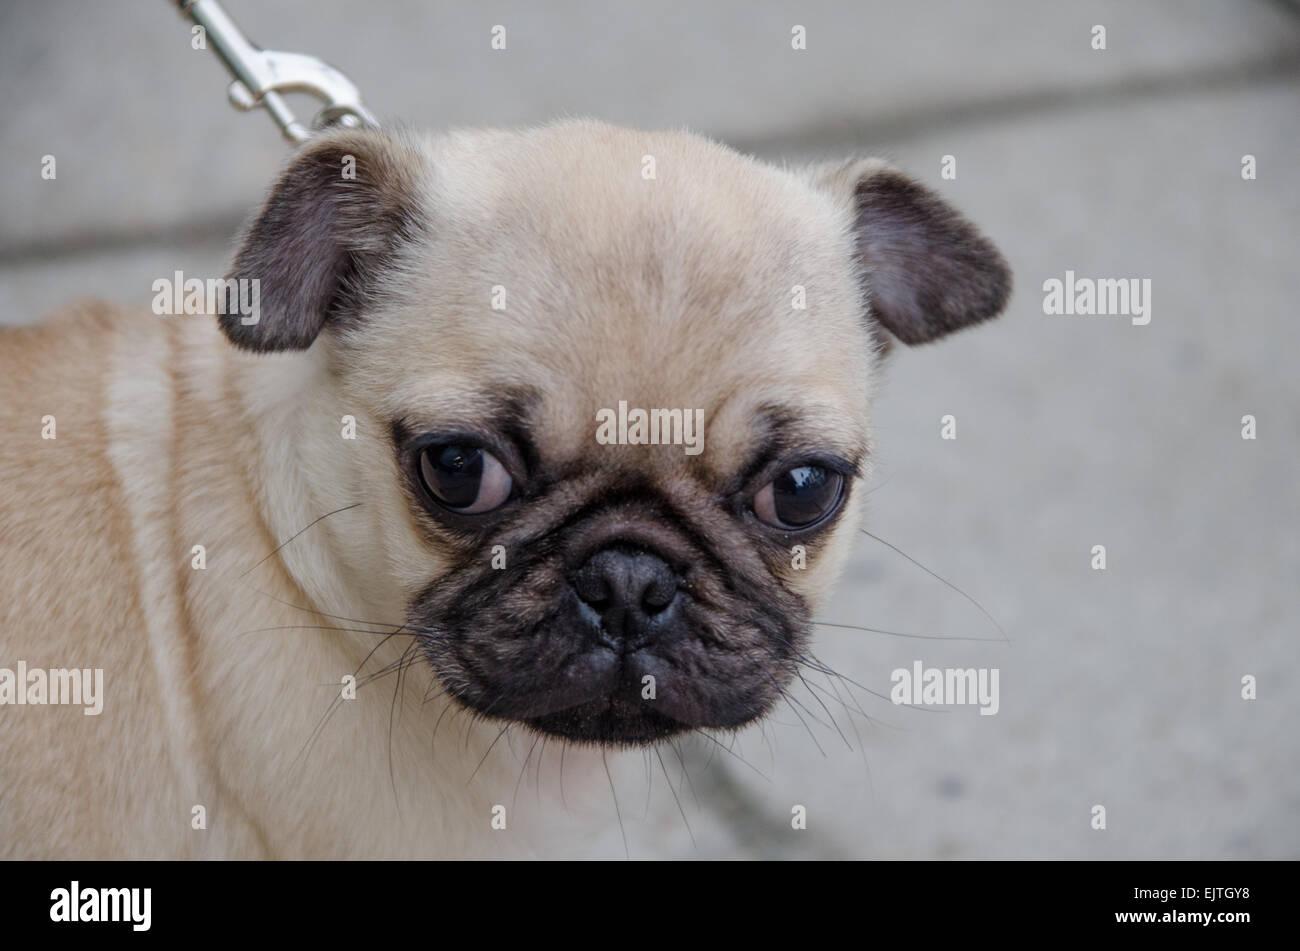 Pug puppy close up - Stock Image